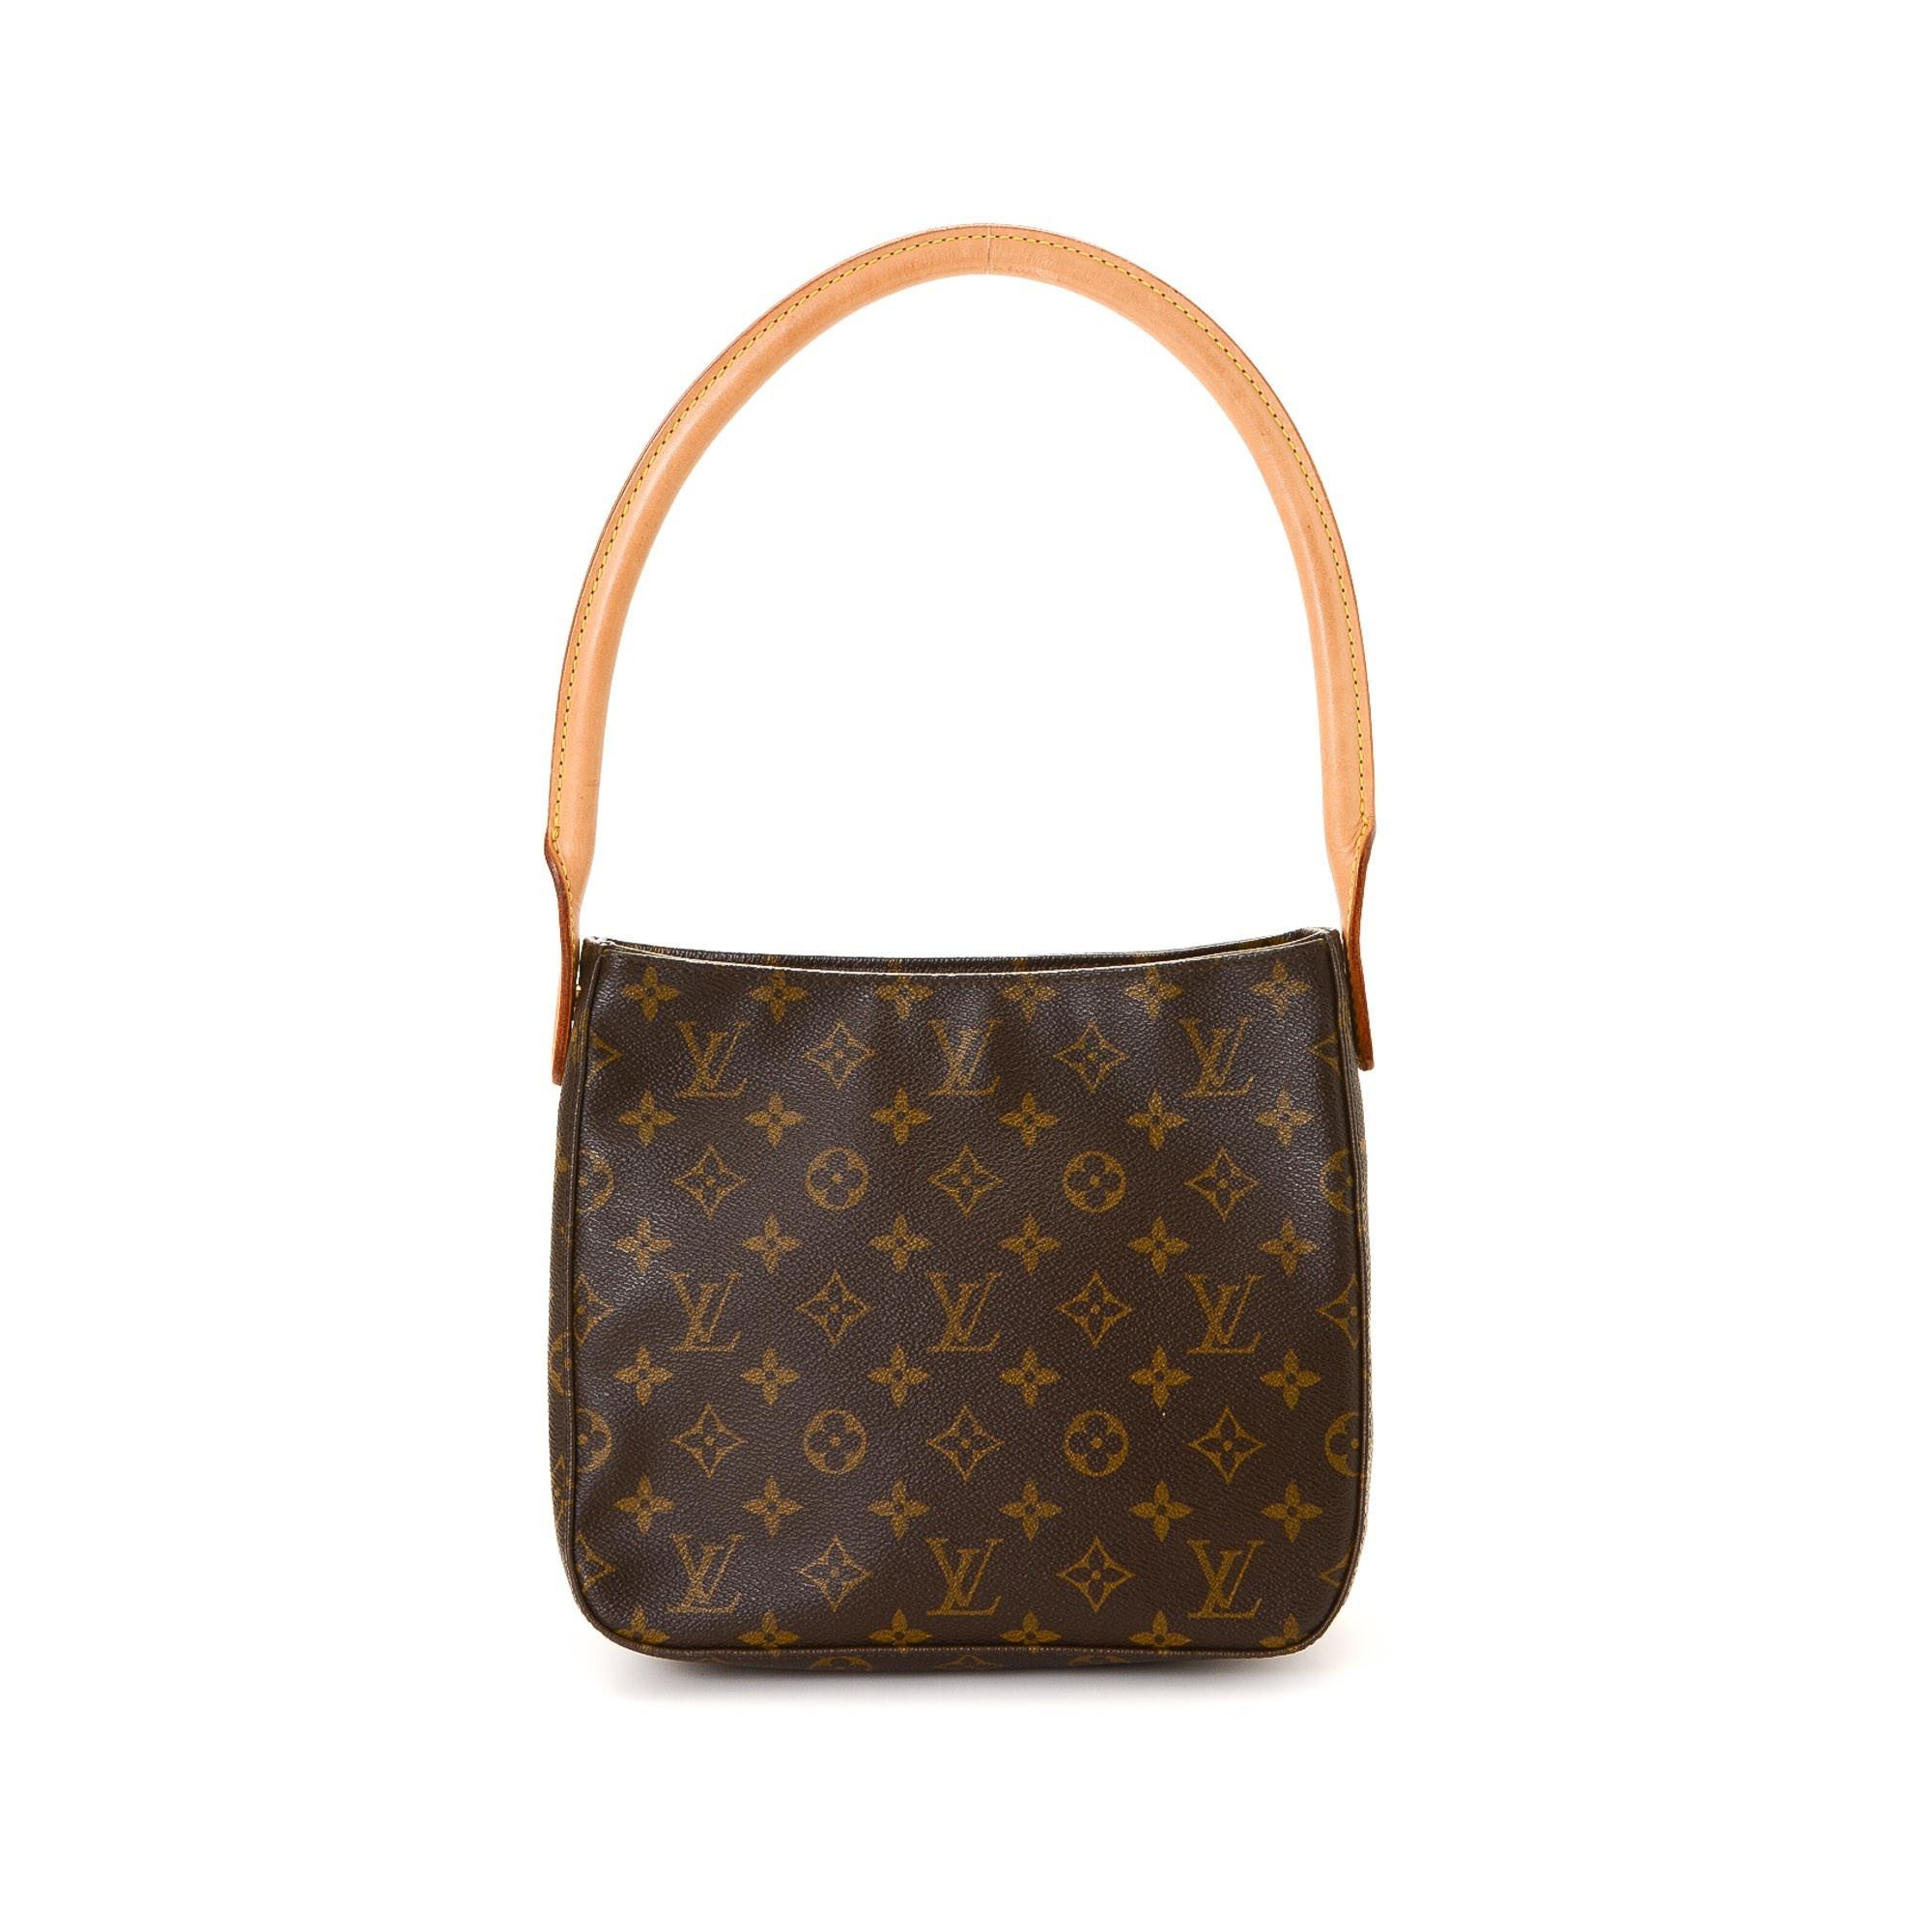 Louis Vuitton Looping MM Monogram Brown Coated Canvas Shoulder Bag LXRCO